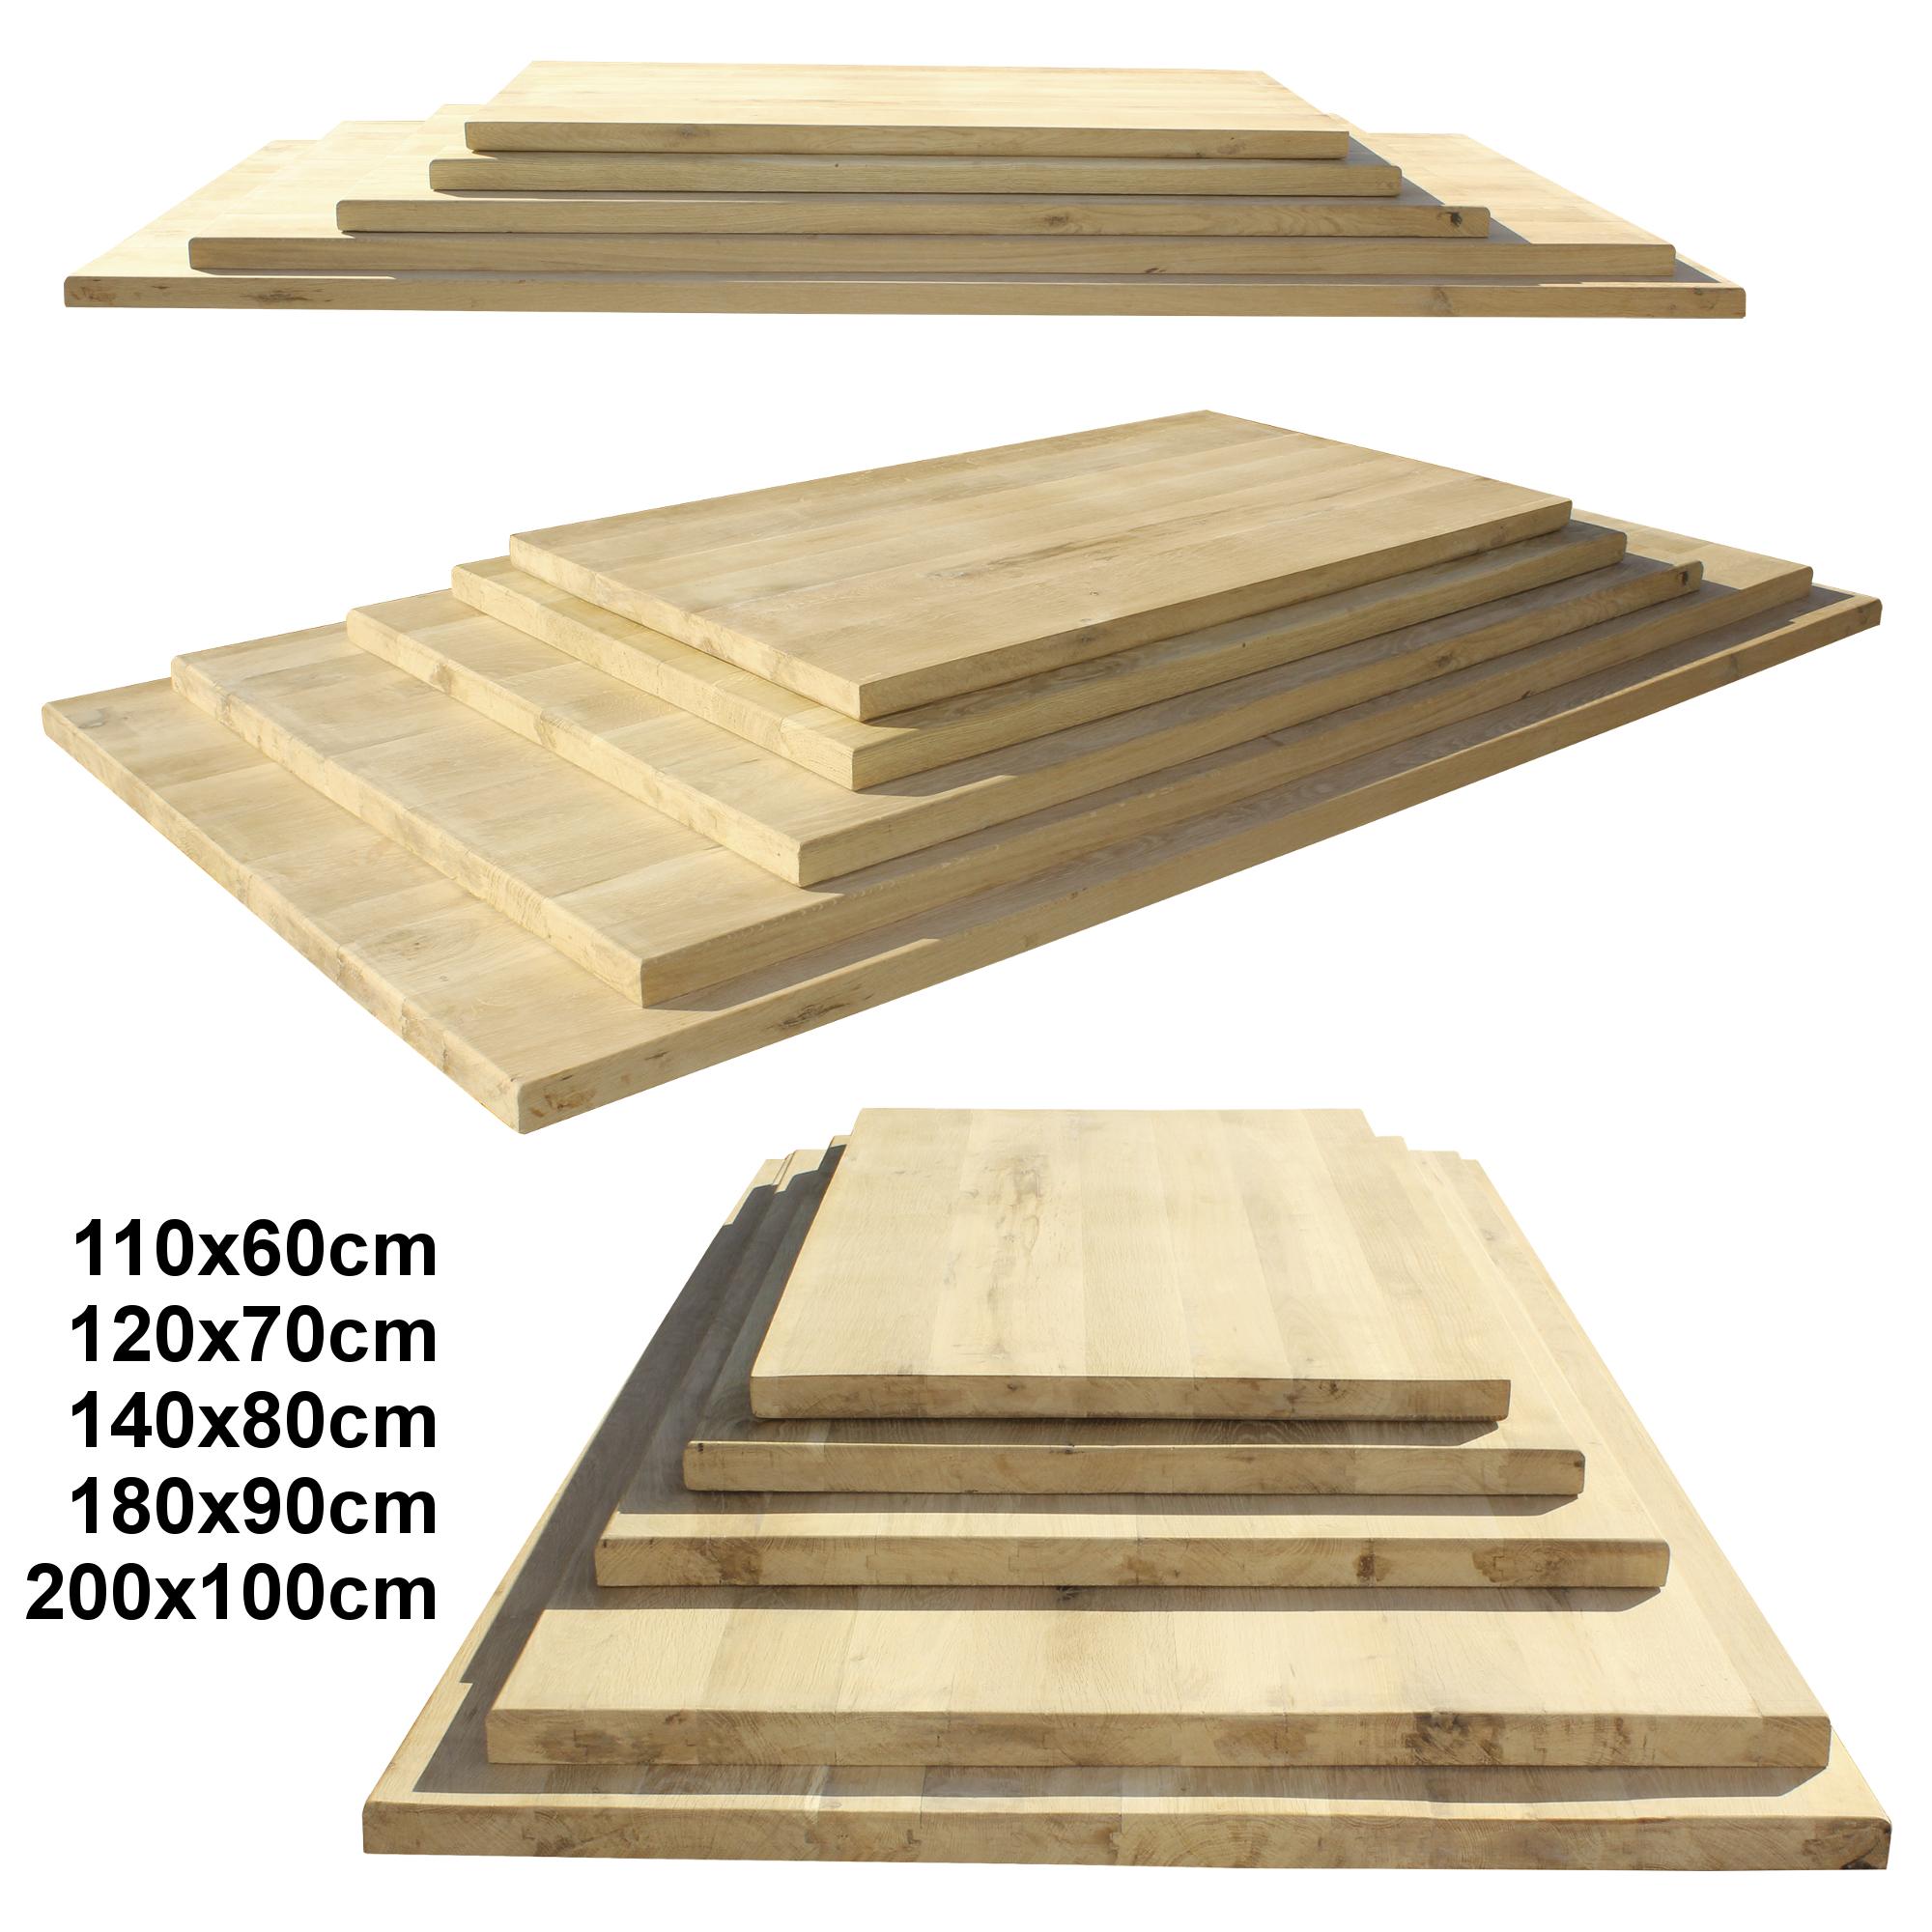 plateau de table ch ne plaque bois solide massif bricolage manger ebay. Black Bedroom Furniture Sets. Home Design Ideas